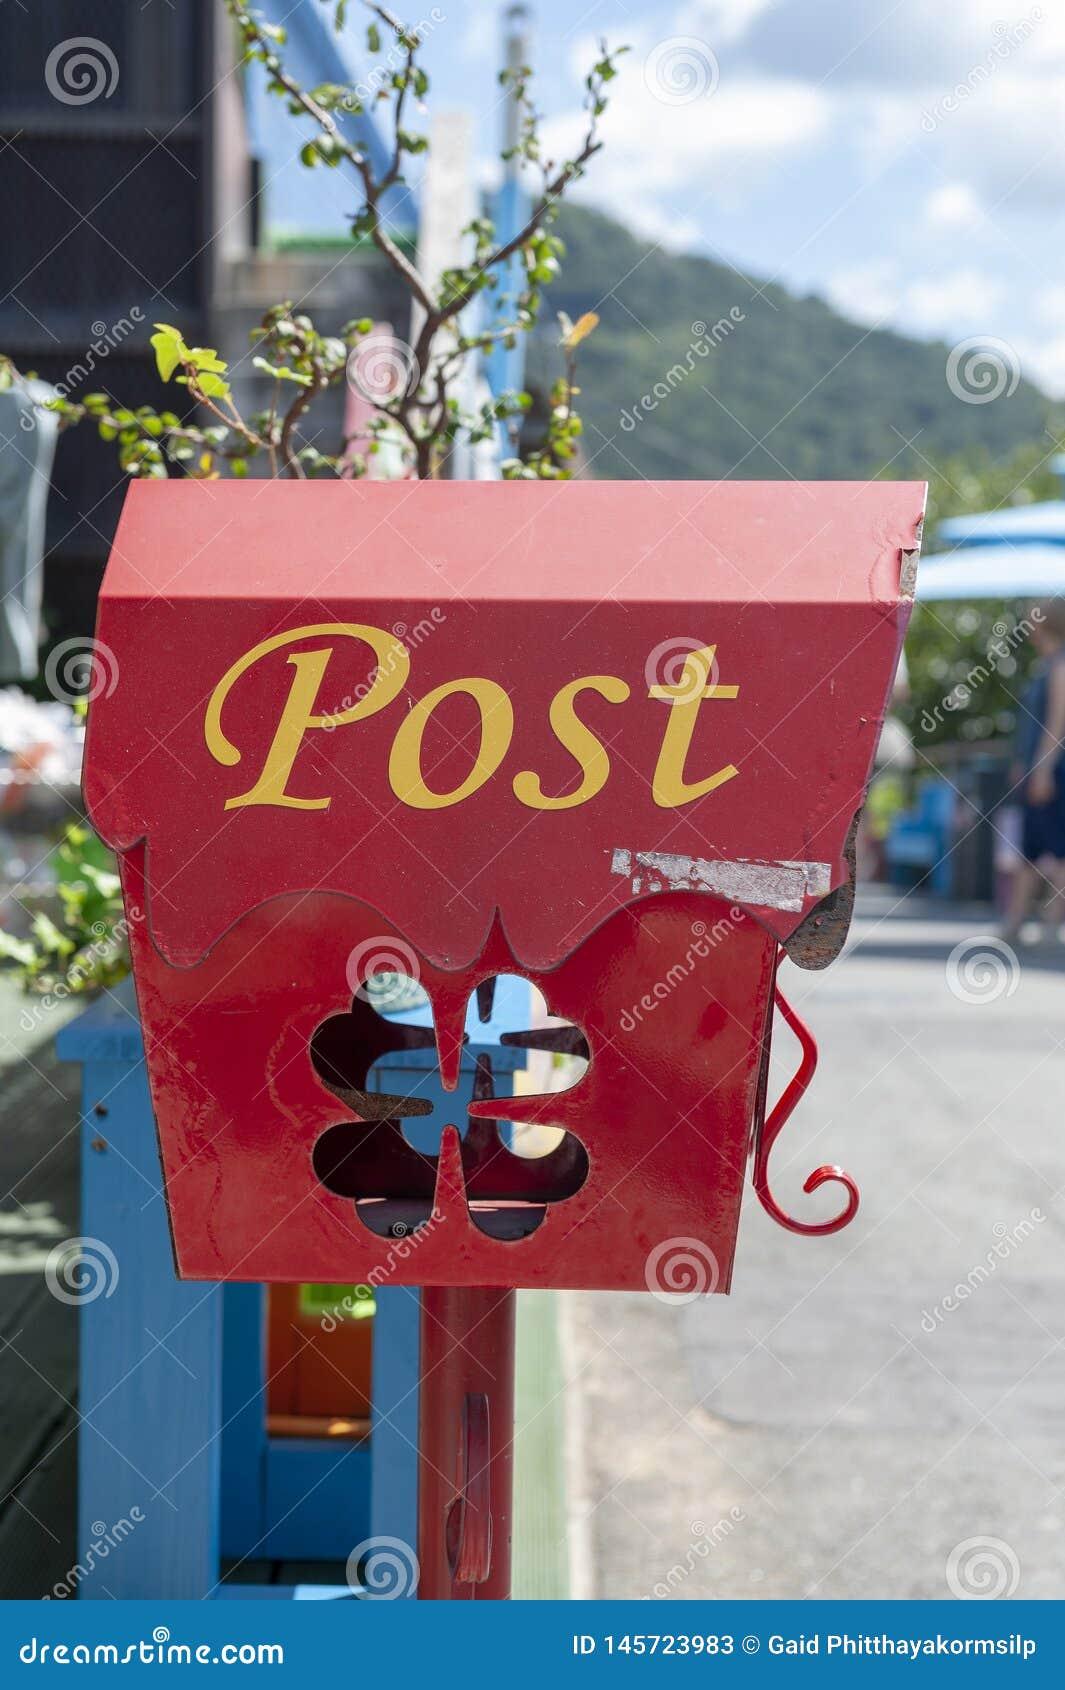 Decorative postbox at a cafe in Jaman Mural Village located near Jeonju Hanok Village in Jeonju, South Korea